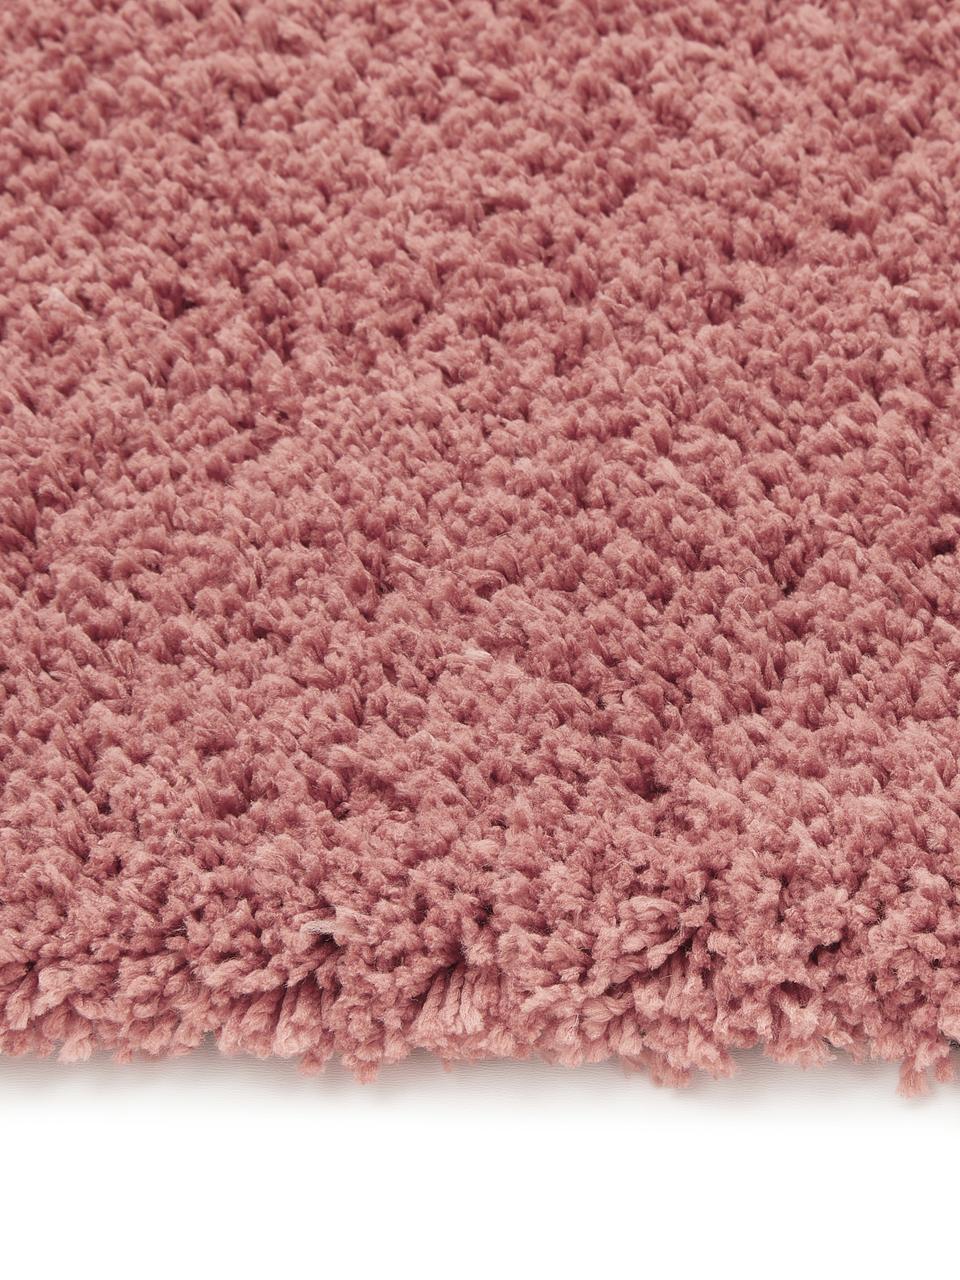 Alfombra de pelo largo Leighton, Parte superior: 100%poliéster (microfibr, Reverso: 70%poliéster, 30%algodó, Terracota, An 200 x L 300 cm (Tamaño L)